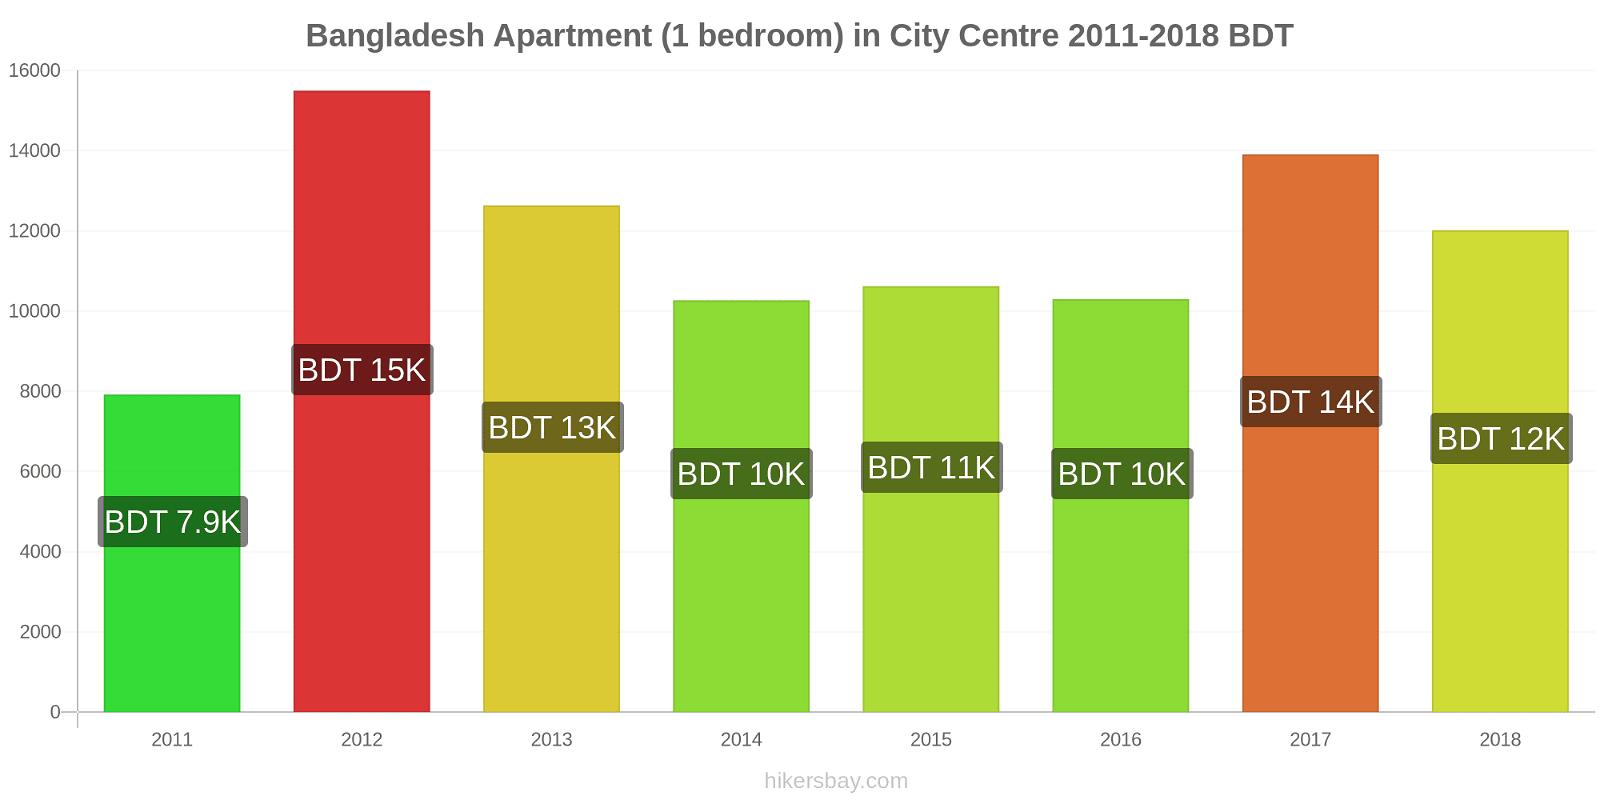 Bangladesh price changes Apartment (1 bedroom) in City Centre hikersbay.com